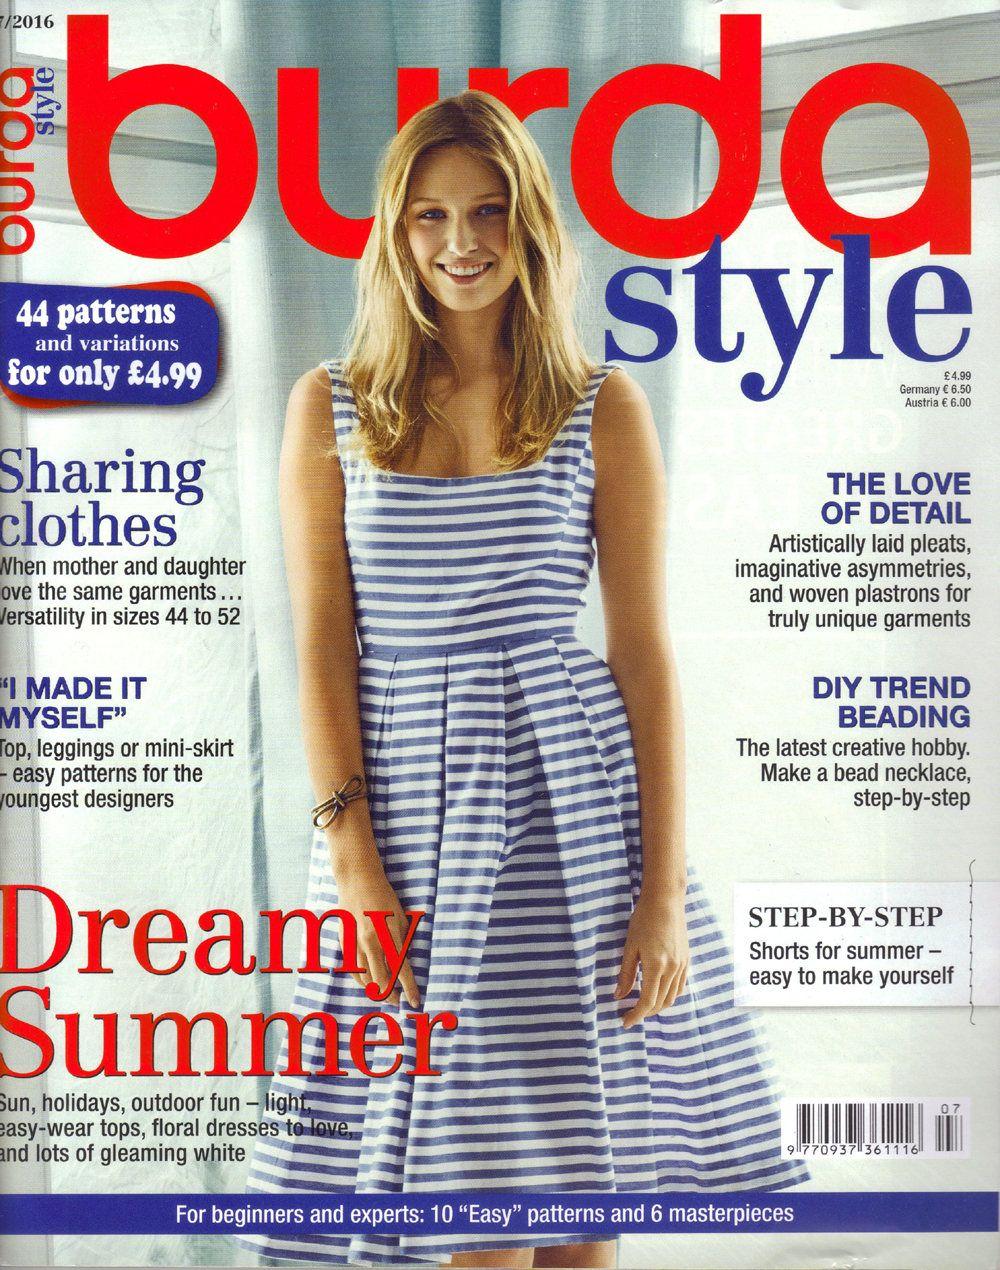 Burda style magazine 72016 english sewing patterns by burda style magazine 72016 english sewing patterns by honeyjamsuniques on etsy jeuxipadfo Image collections